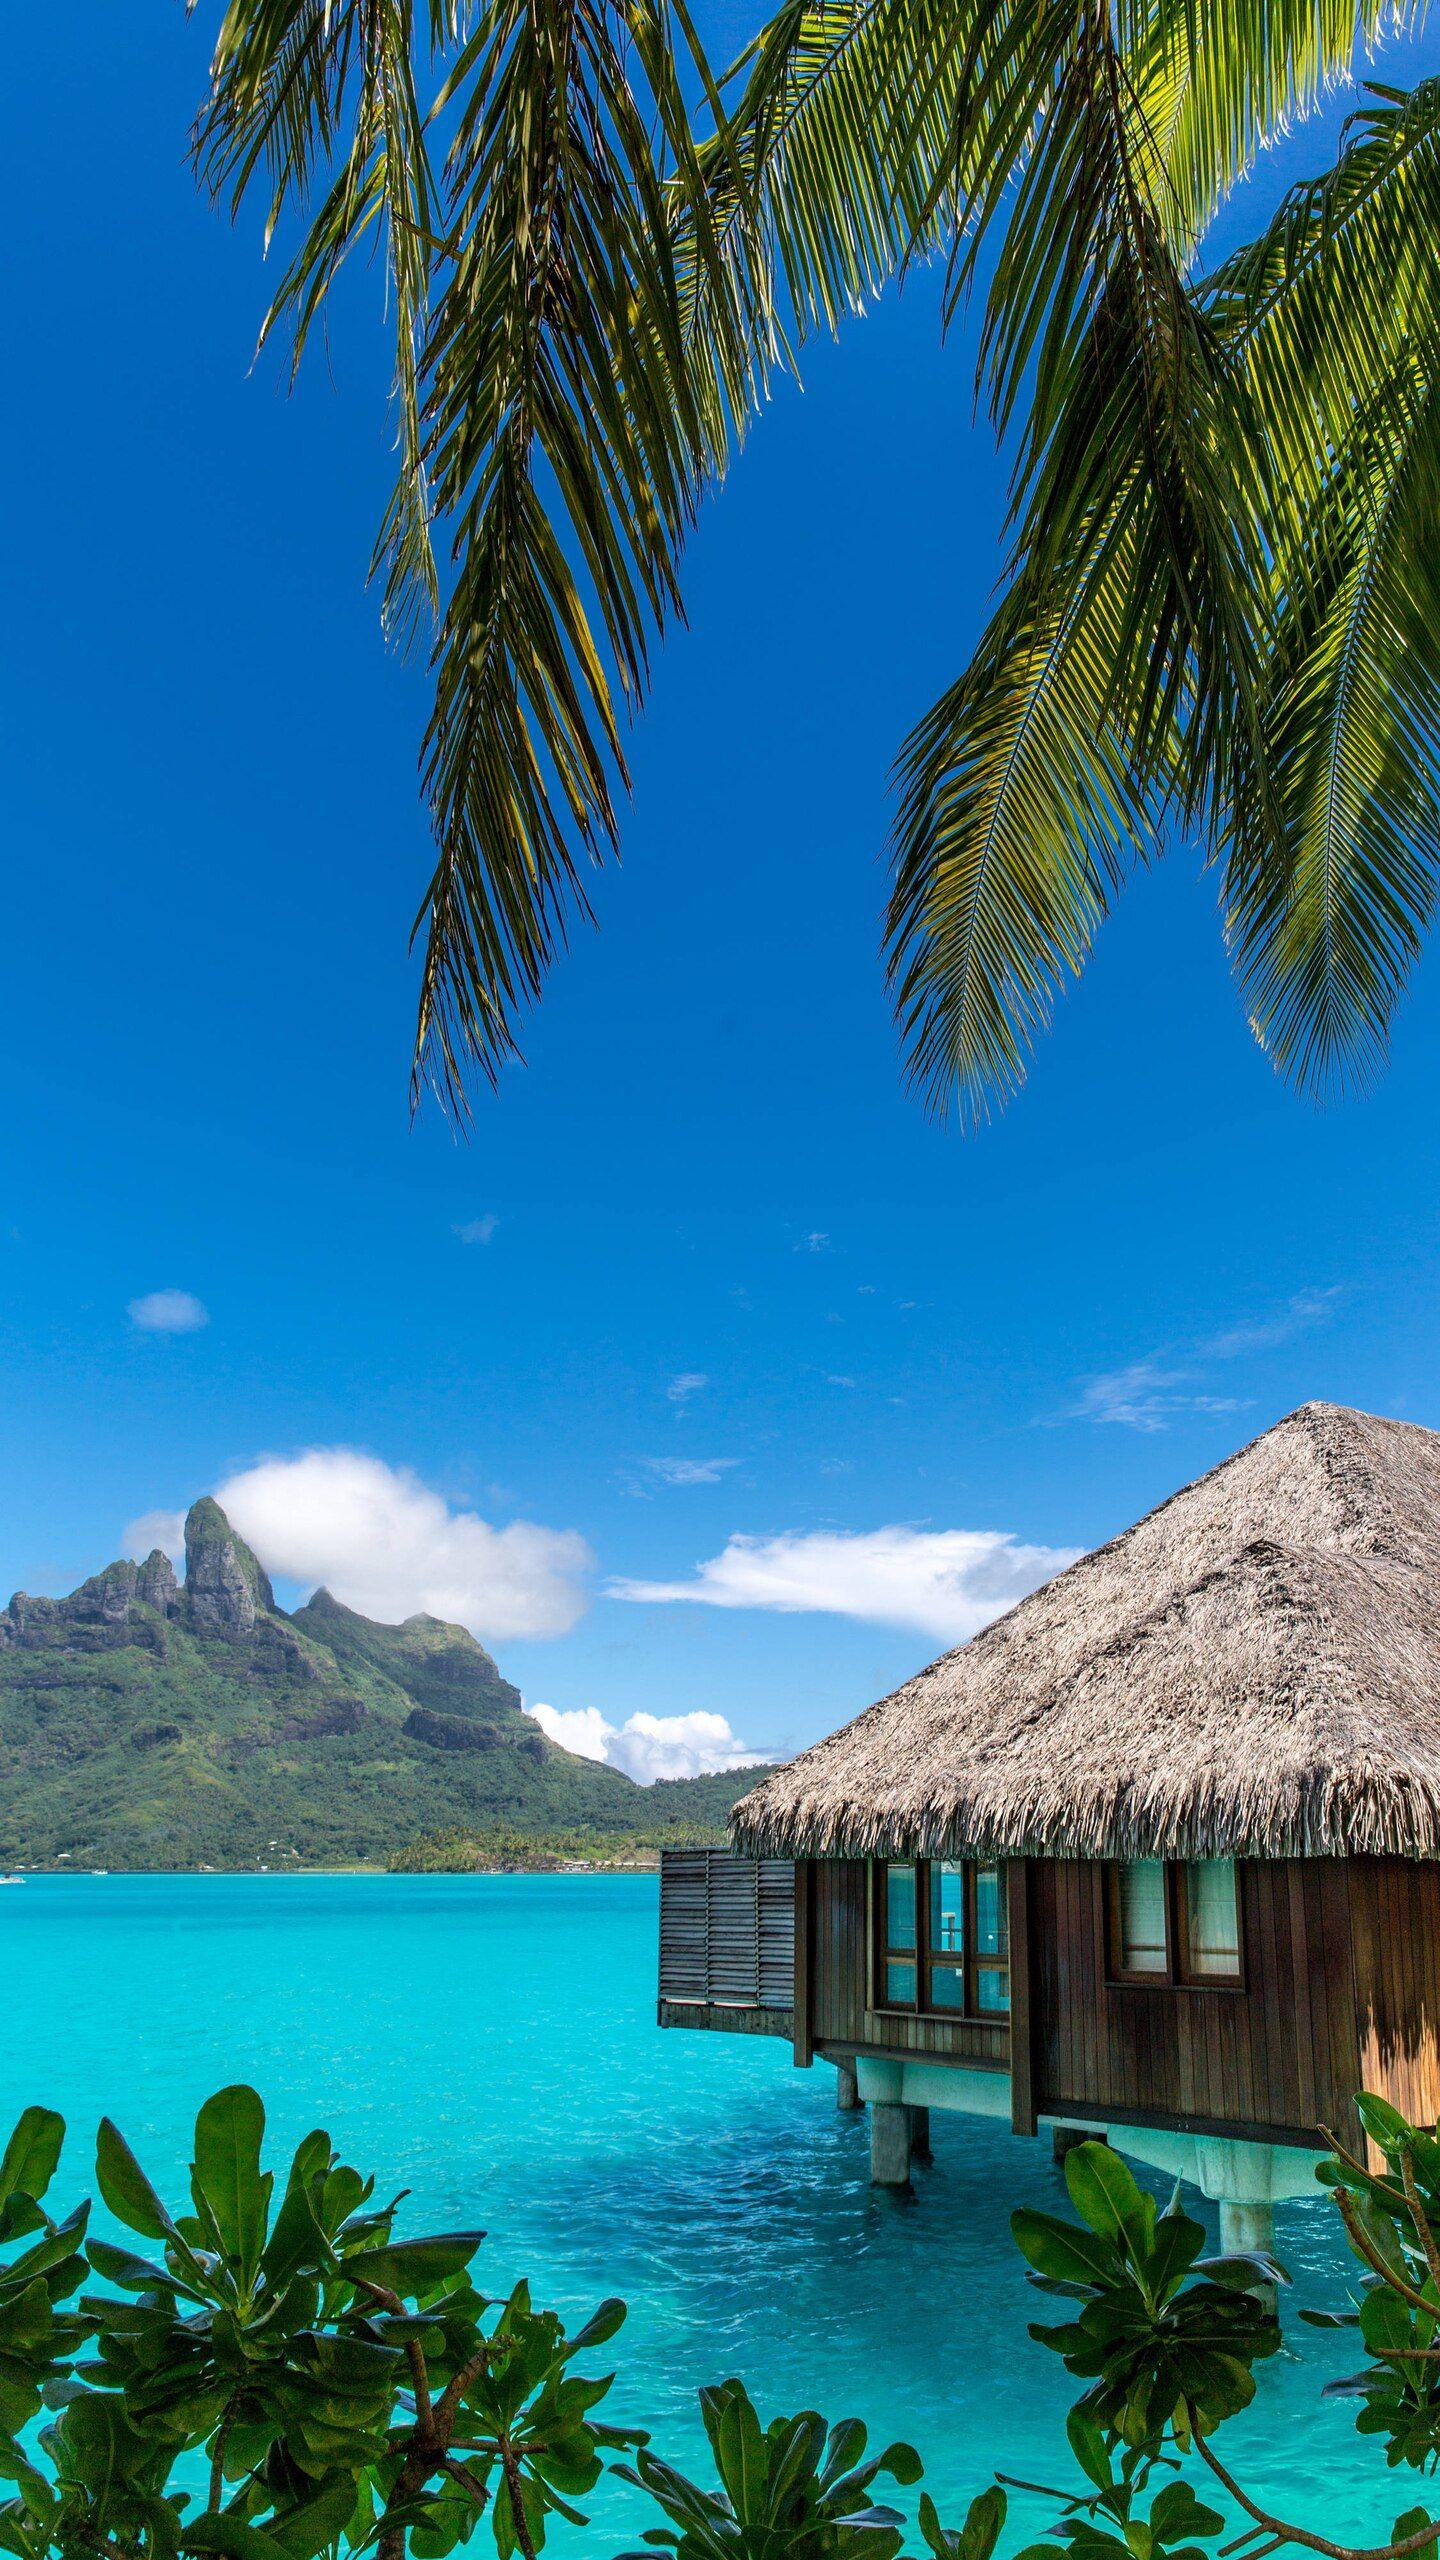 Honeymoon inspo: The St. Regis Bora Bora Resort  #vacationdestinations